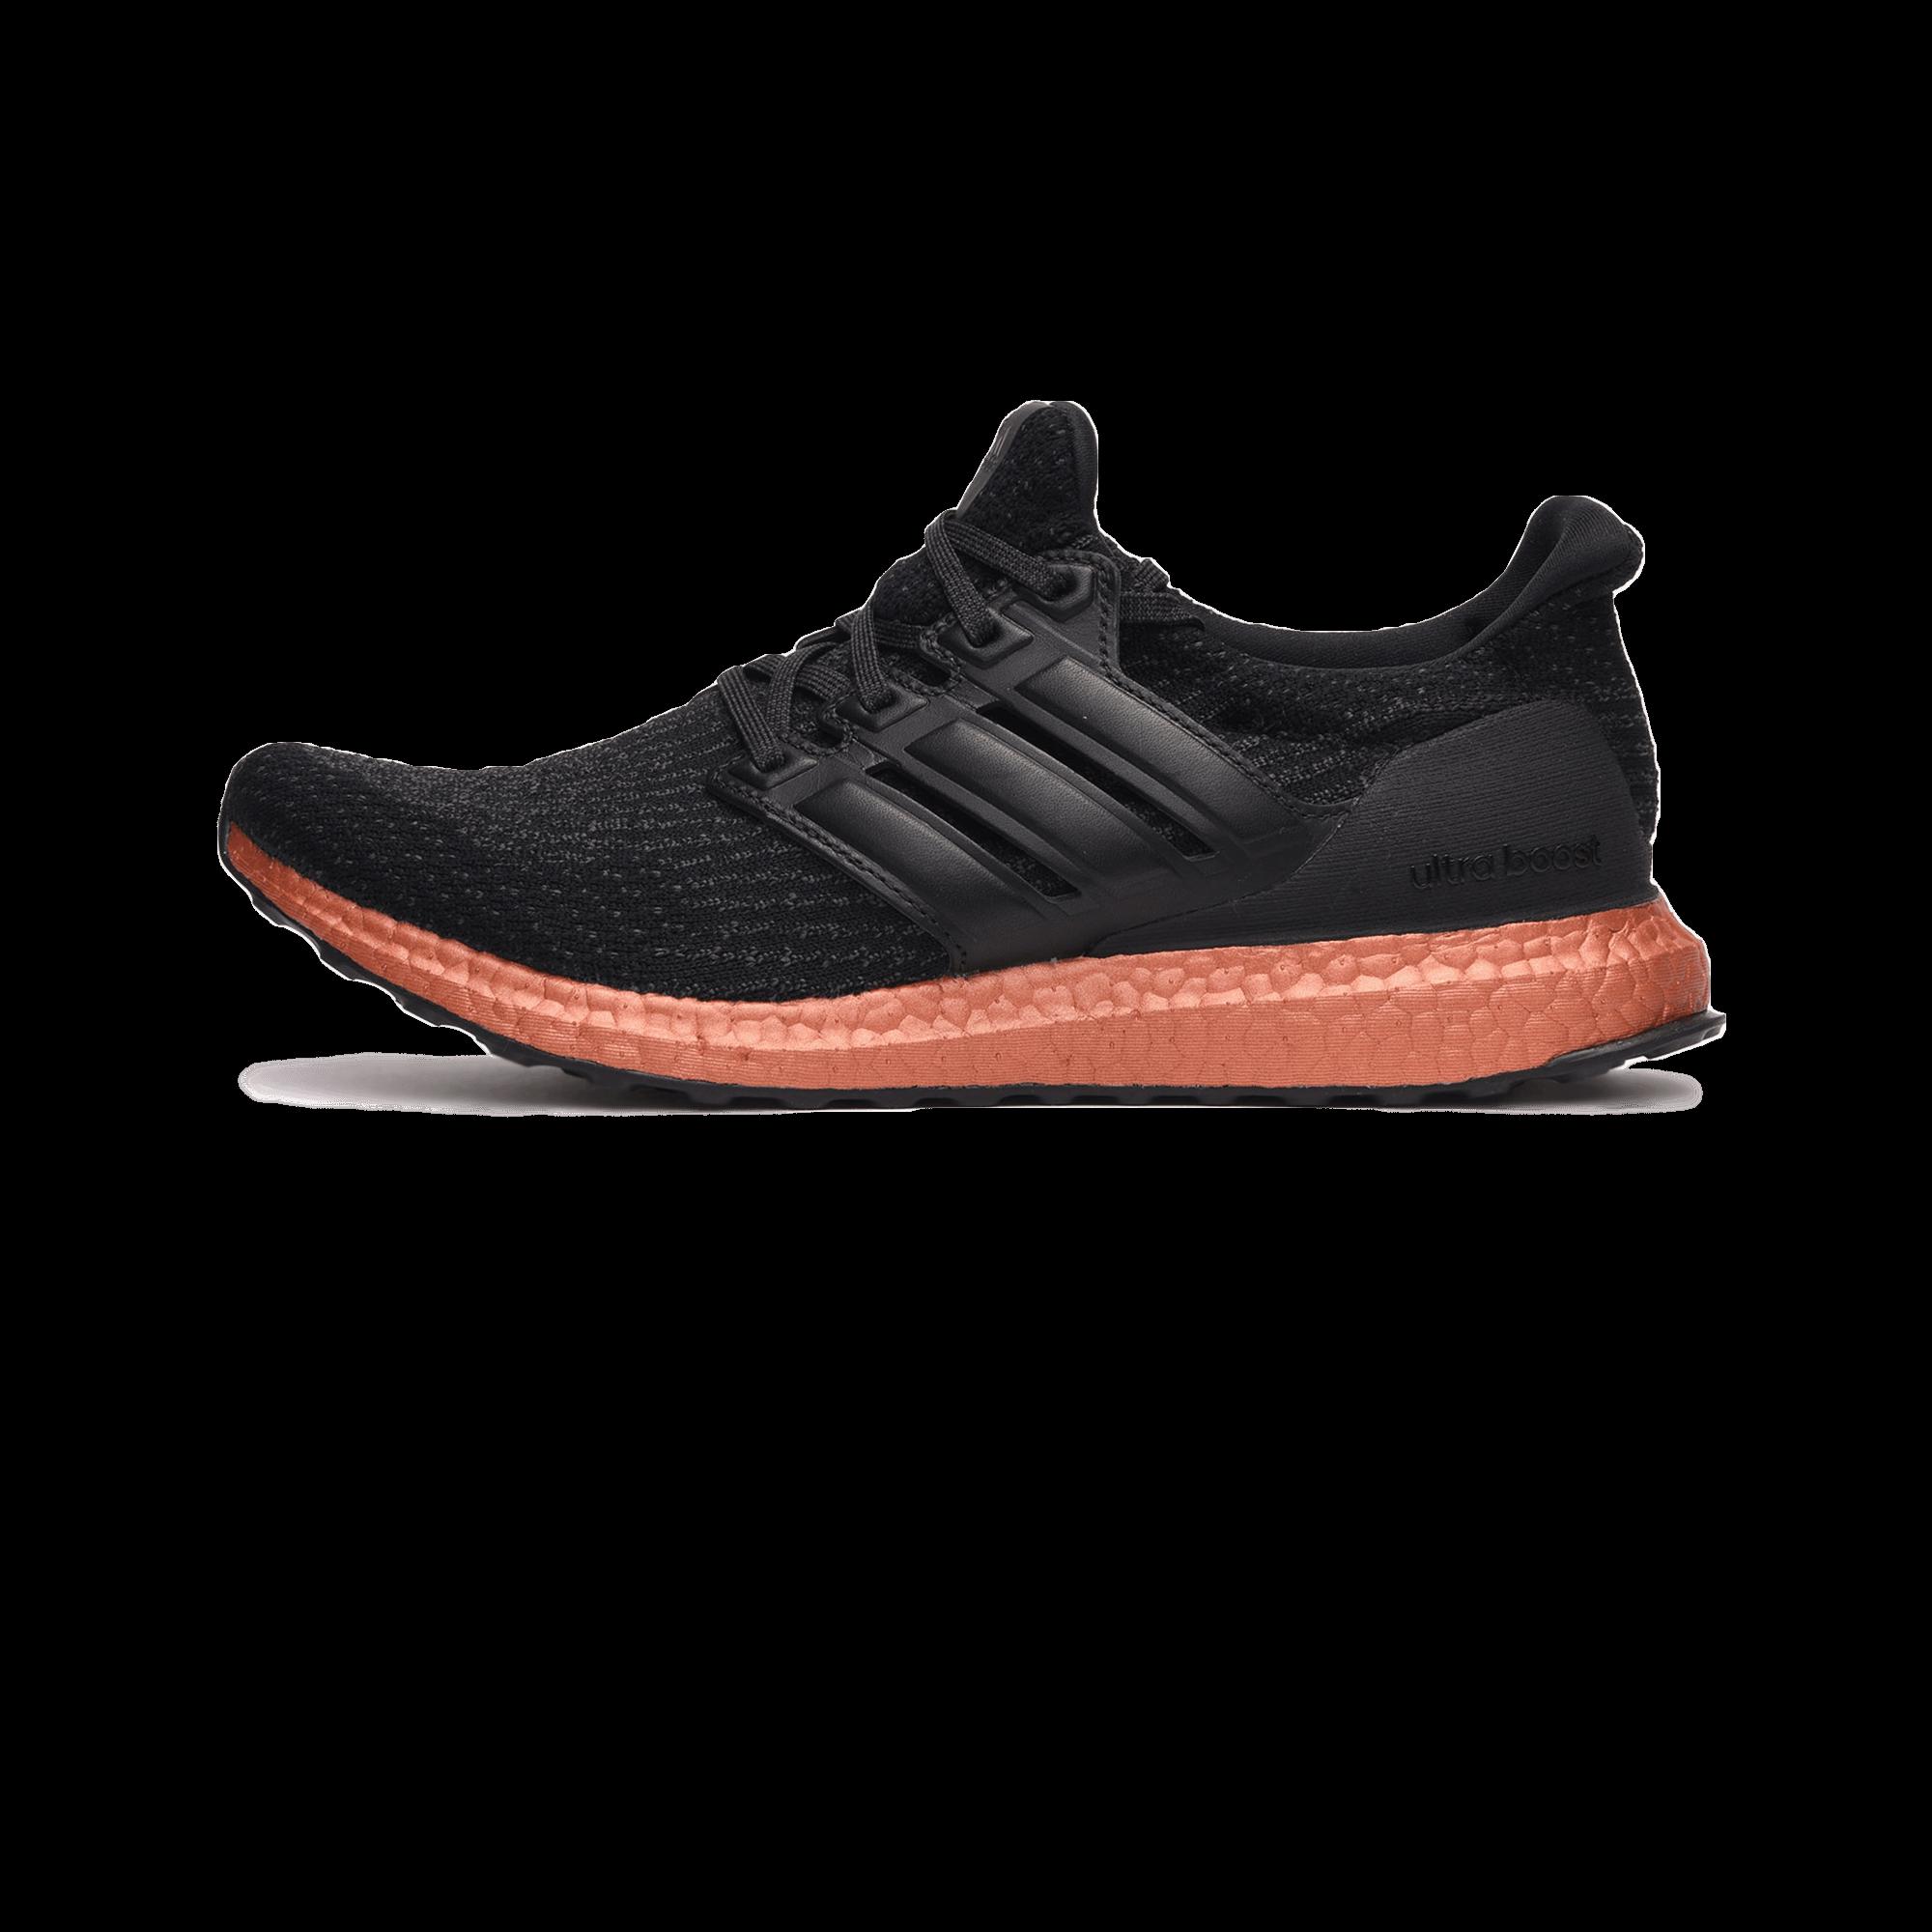 f4bb6ec02ff adidas Ultra Boost Bronze core black copper - Men